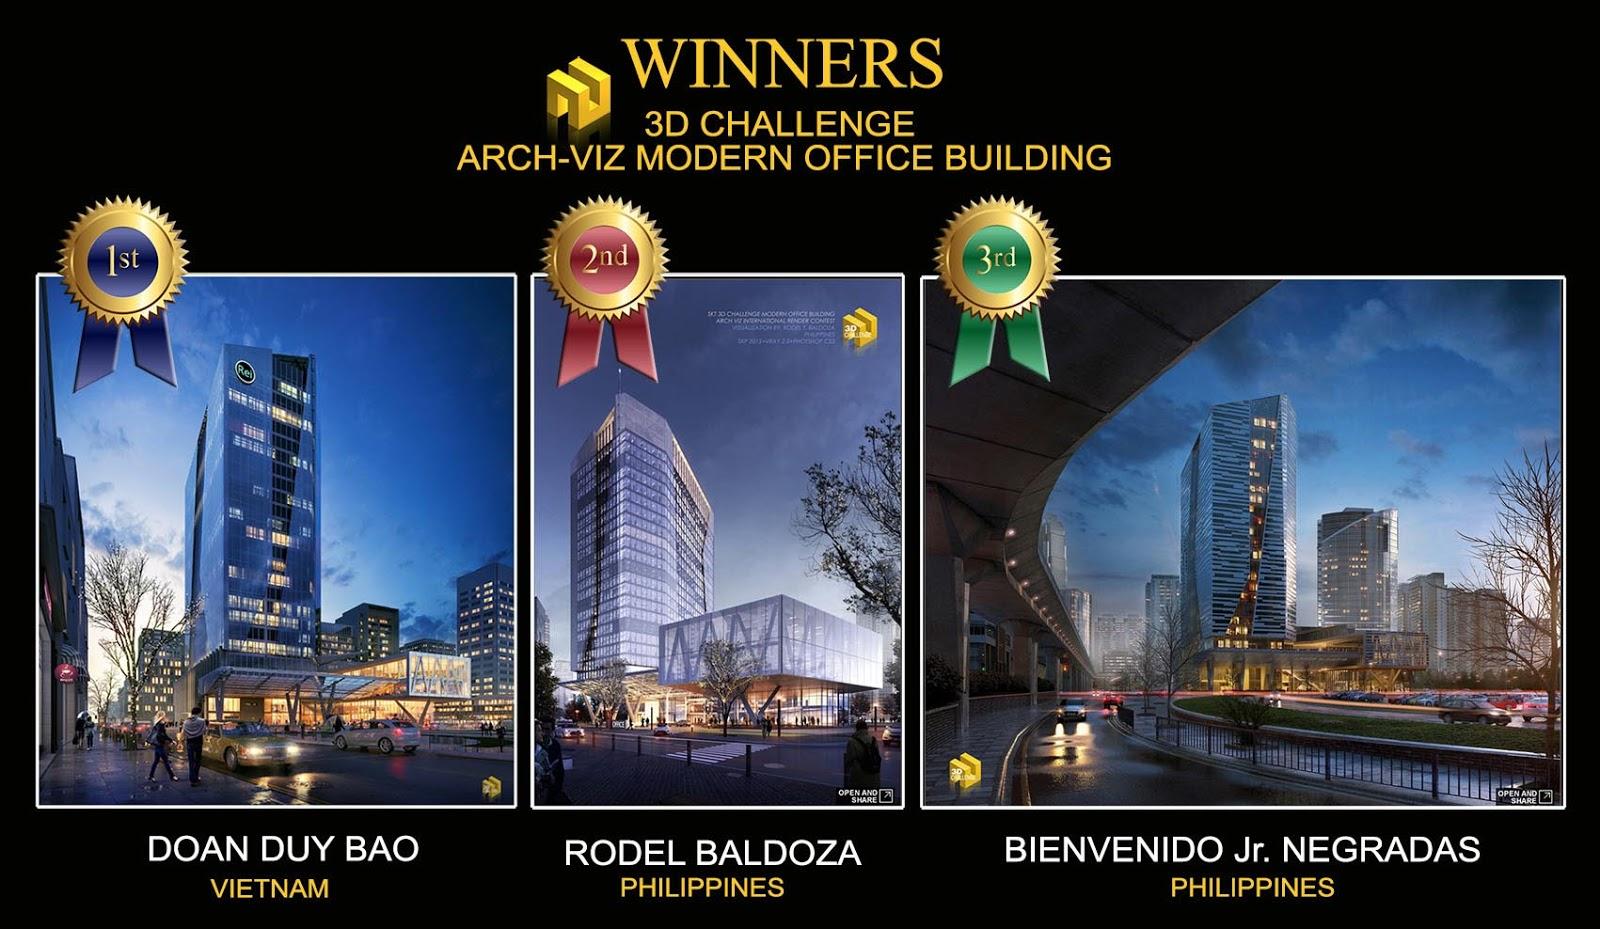 Winners 3D challenge archviz modern office building contes